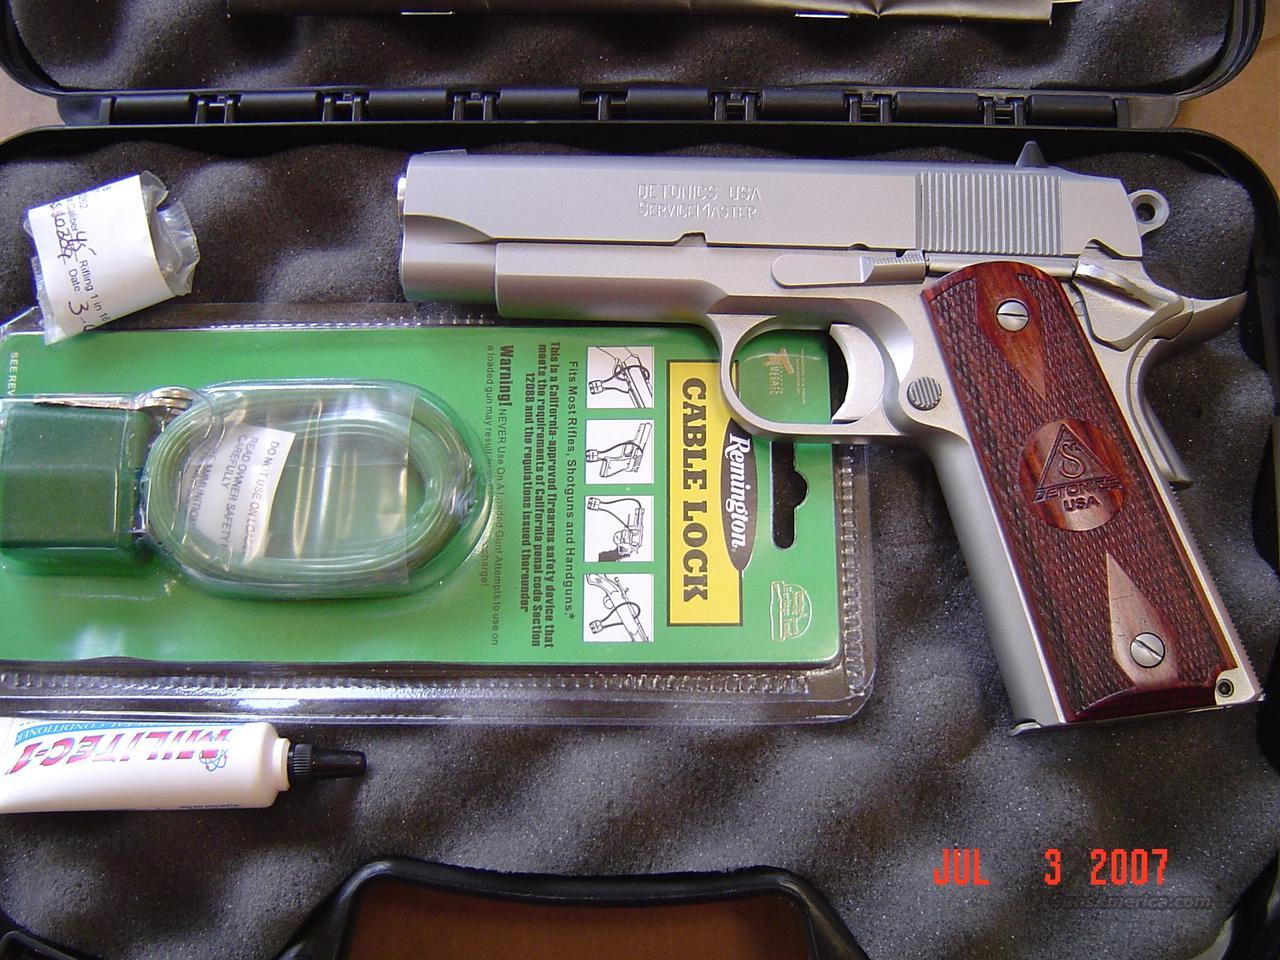 DETONICS 1911 SERVICE MASTER  Guns > Pistols > 1911 Pistol Copies (non-Colt)